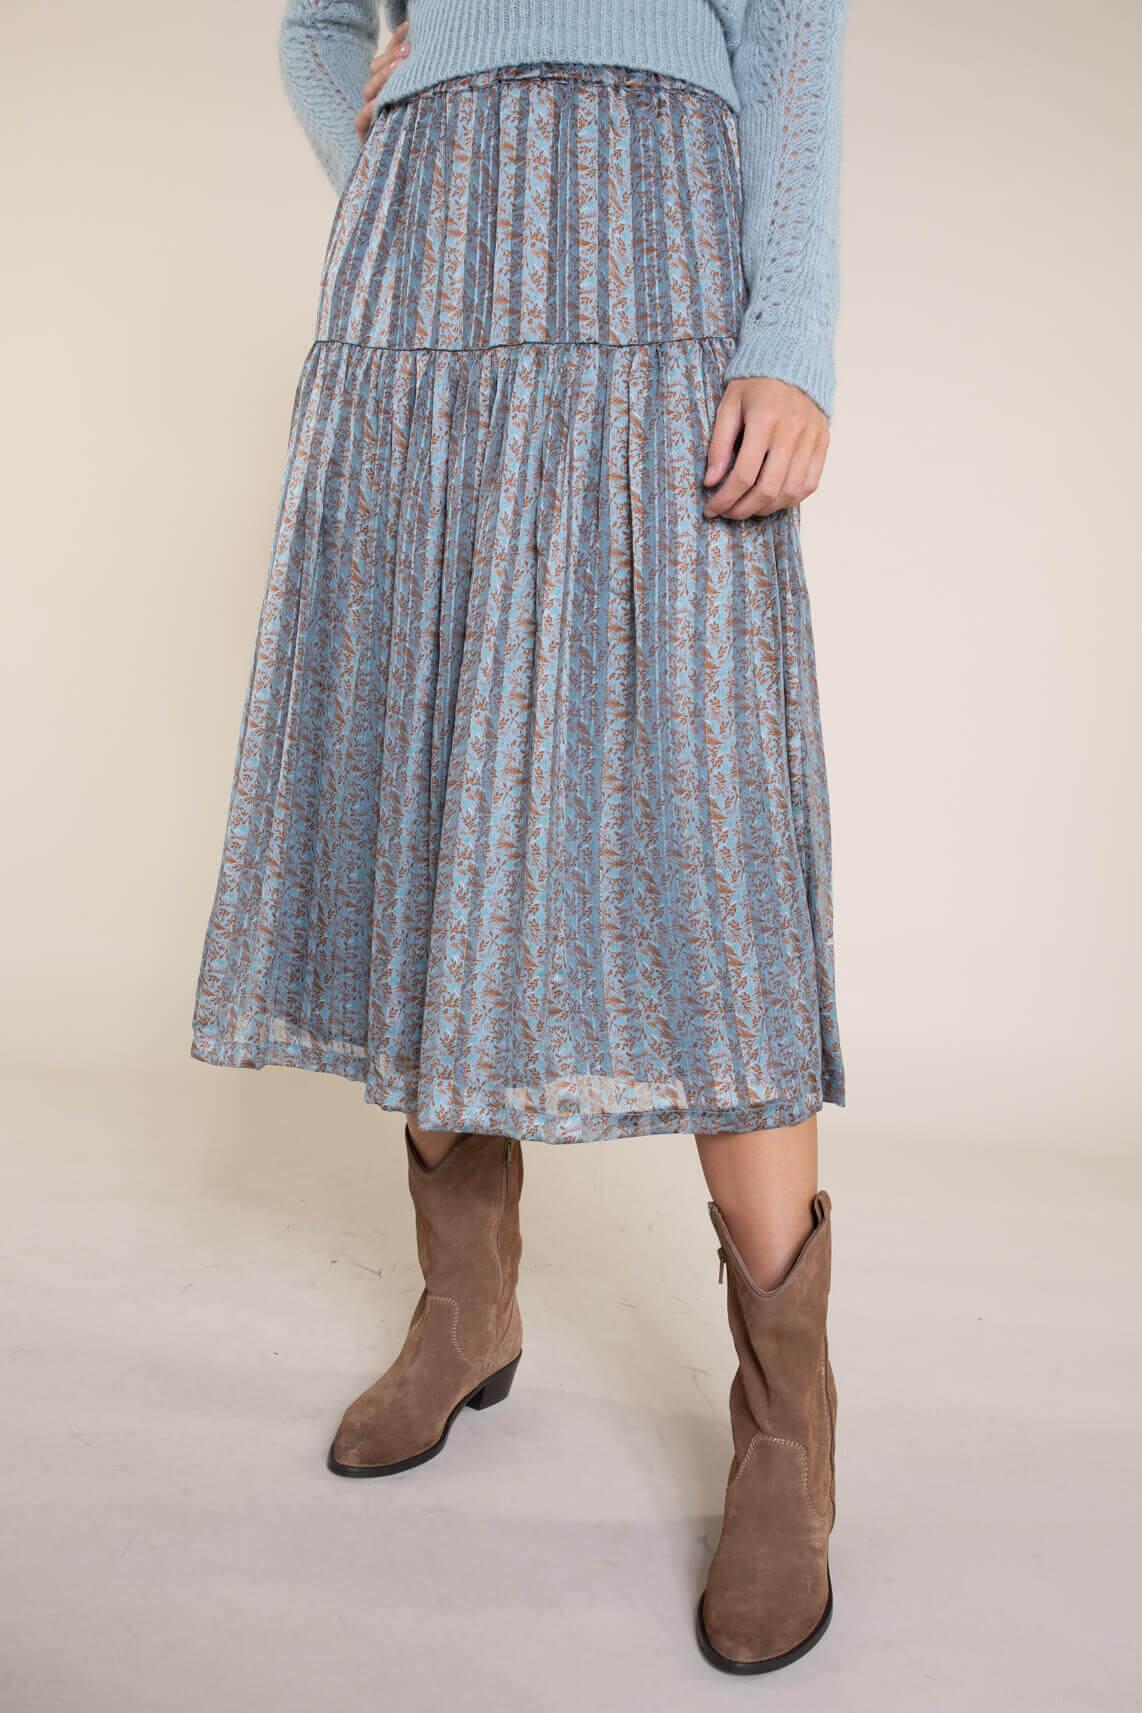 Lollys Laundry Dames Cokko rok Blauw